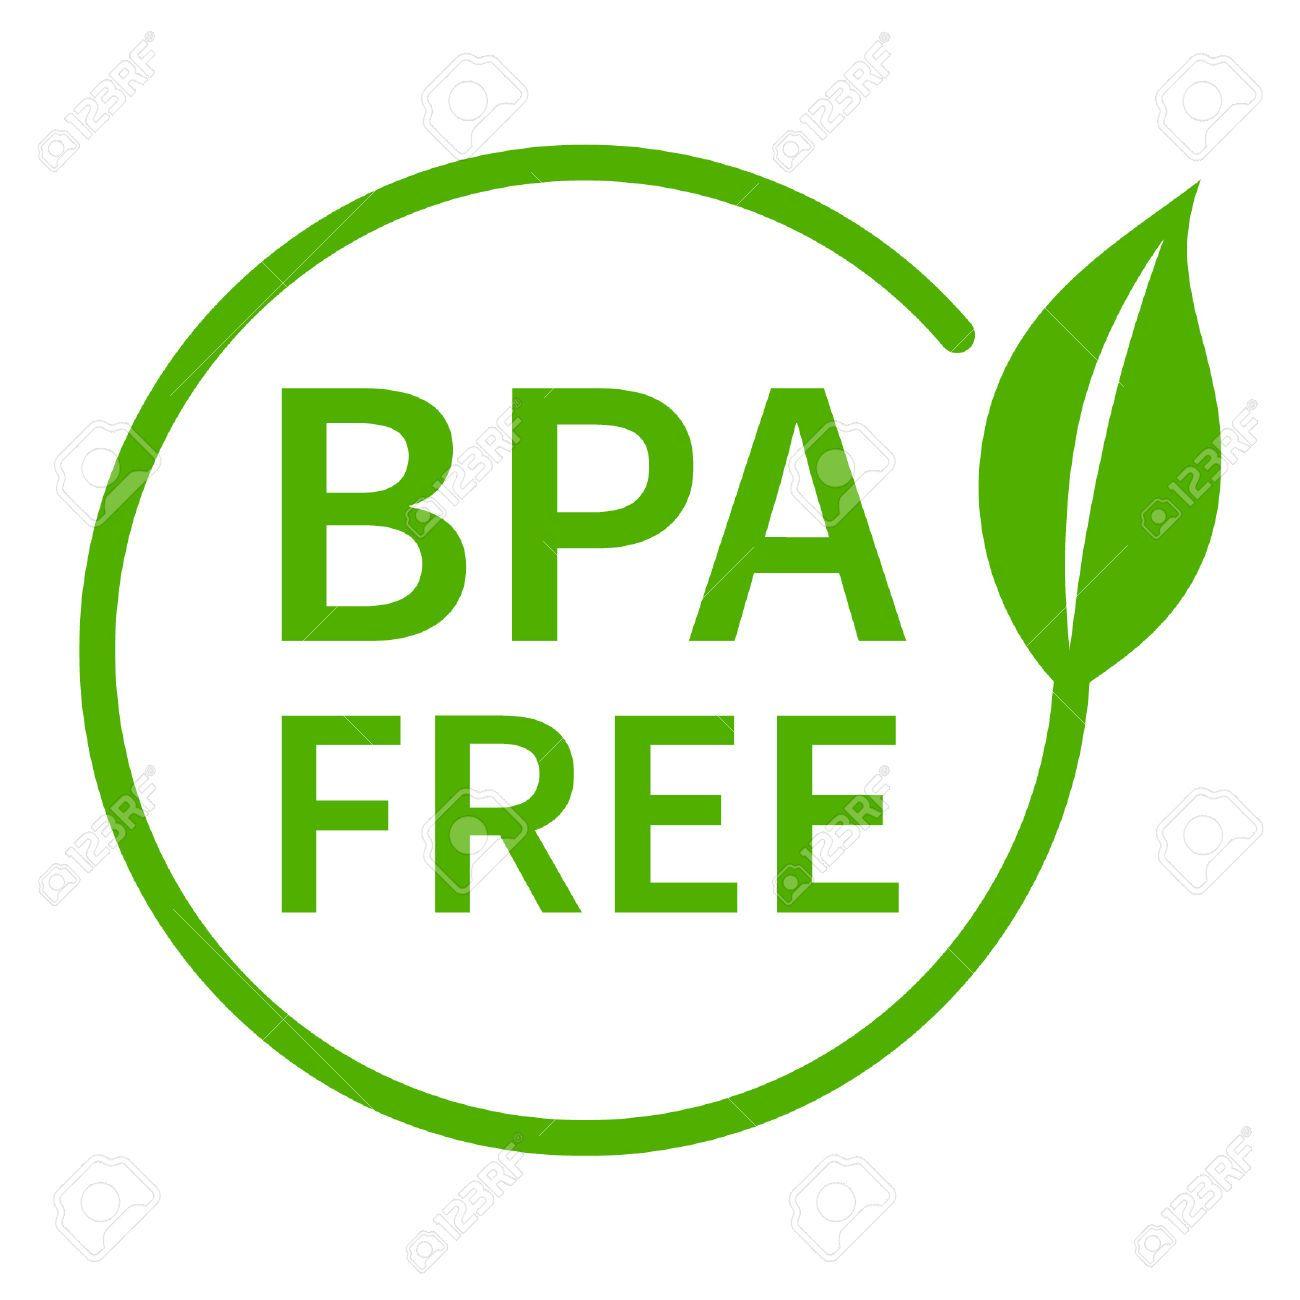 Bpa free symbol google search icons pinterest free symbols bpa free symbol google search biocorpaavc Gallery